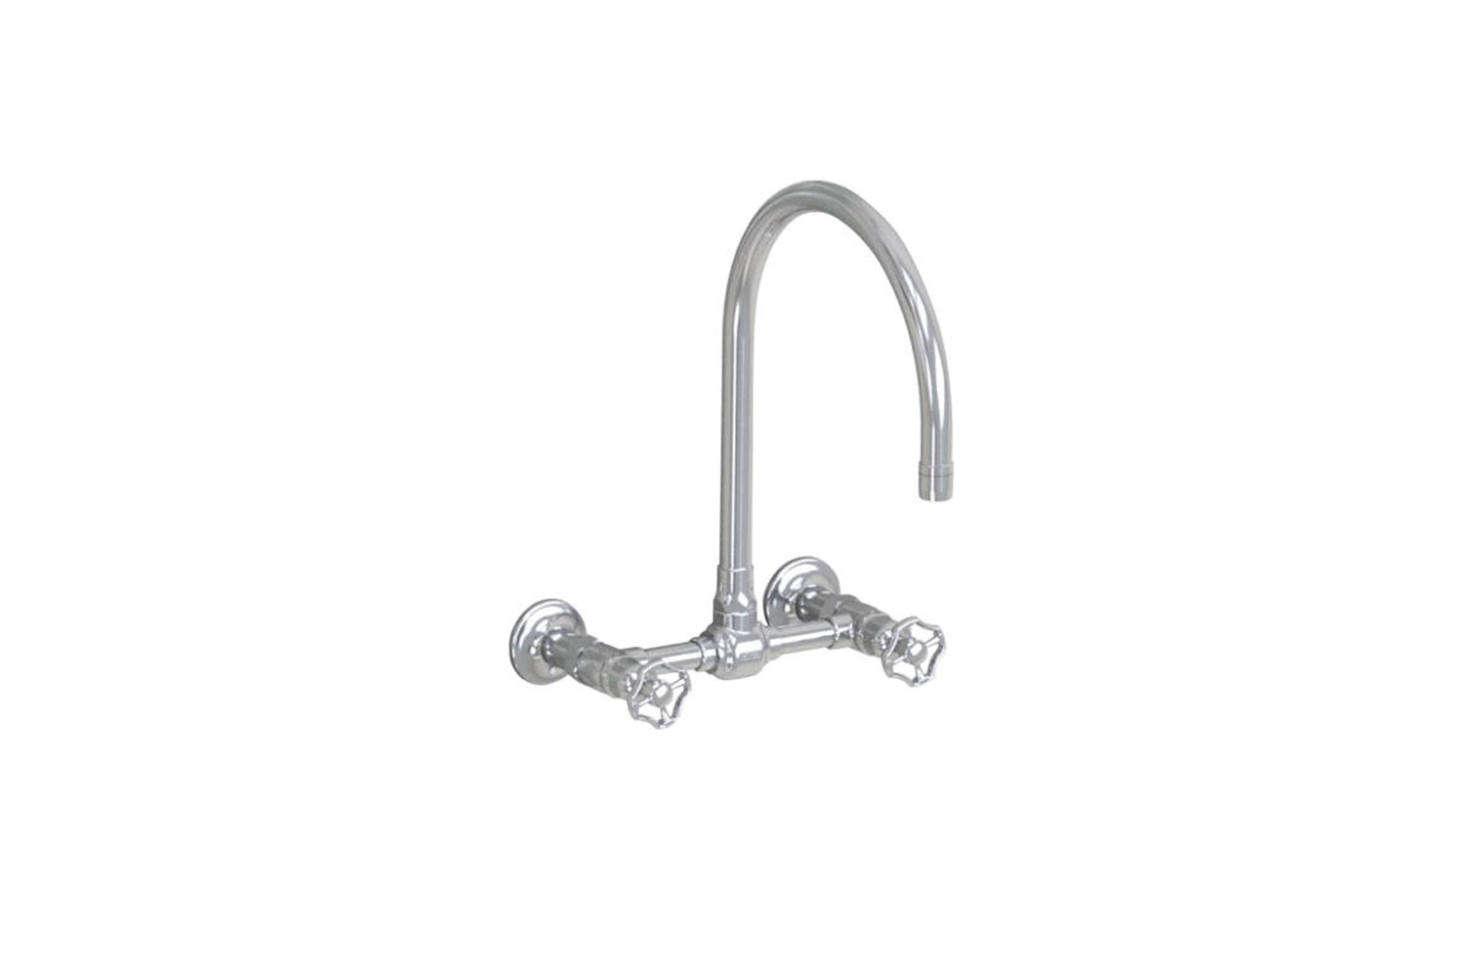 10 Easy Pieces: Editors\' Favorite Kitchen Faucets - Remodelista